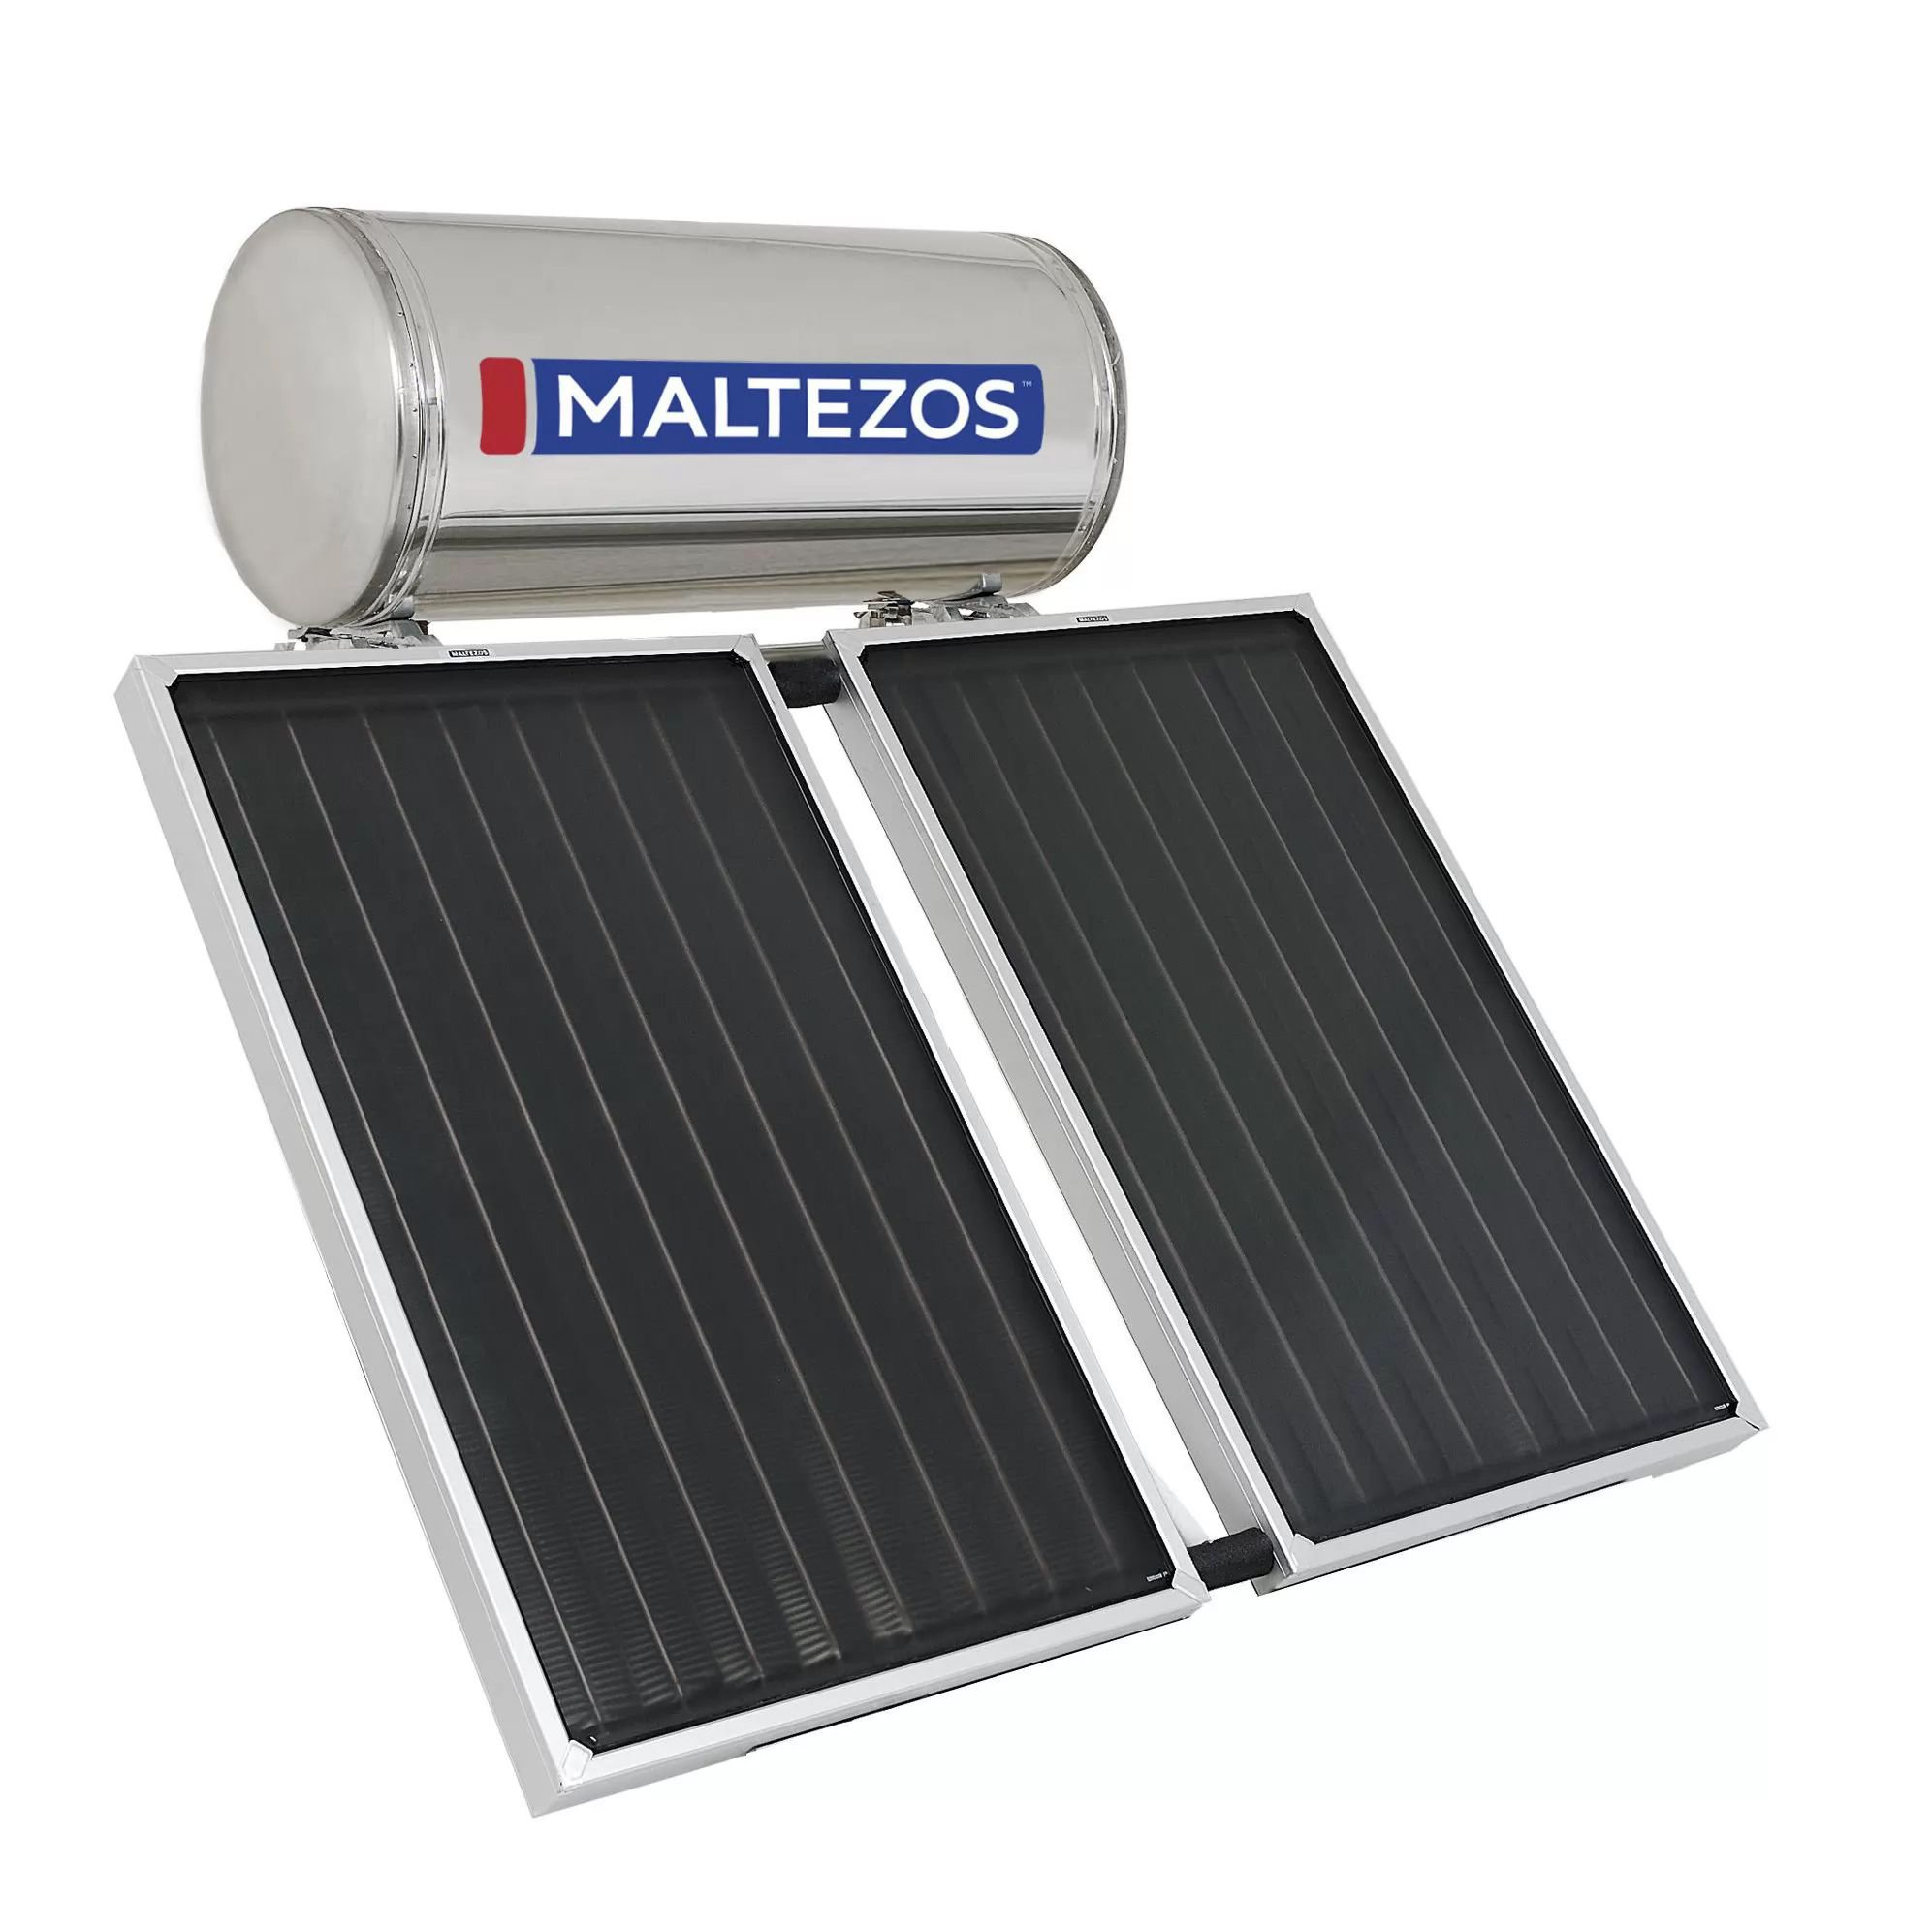 MALTEZOS MALT H 200Lt INOX Τρπλής Ενεργείας 2 Επιλεκτικοί Συλλέκτες 2 SAC 100x150